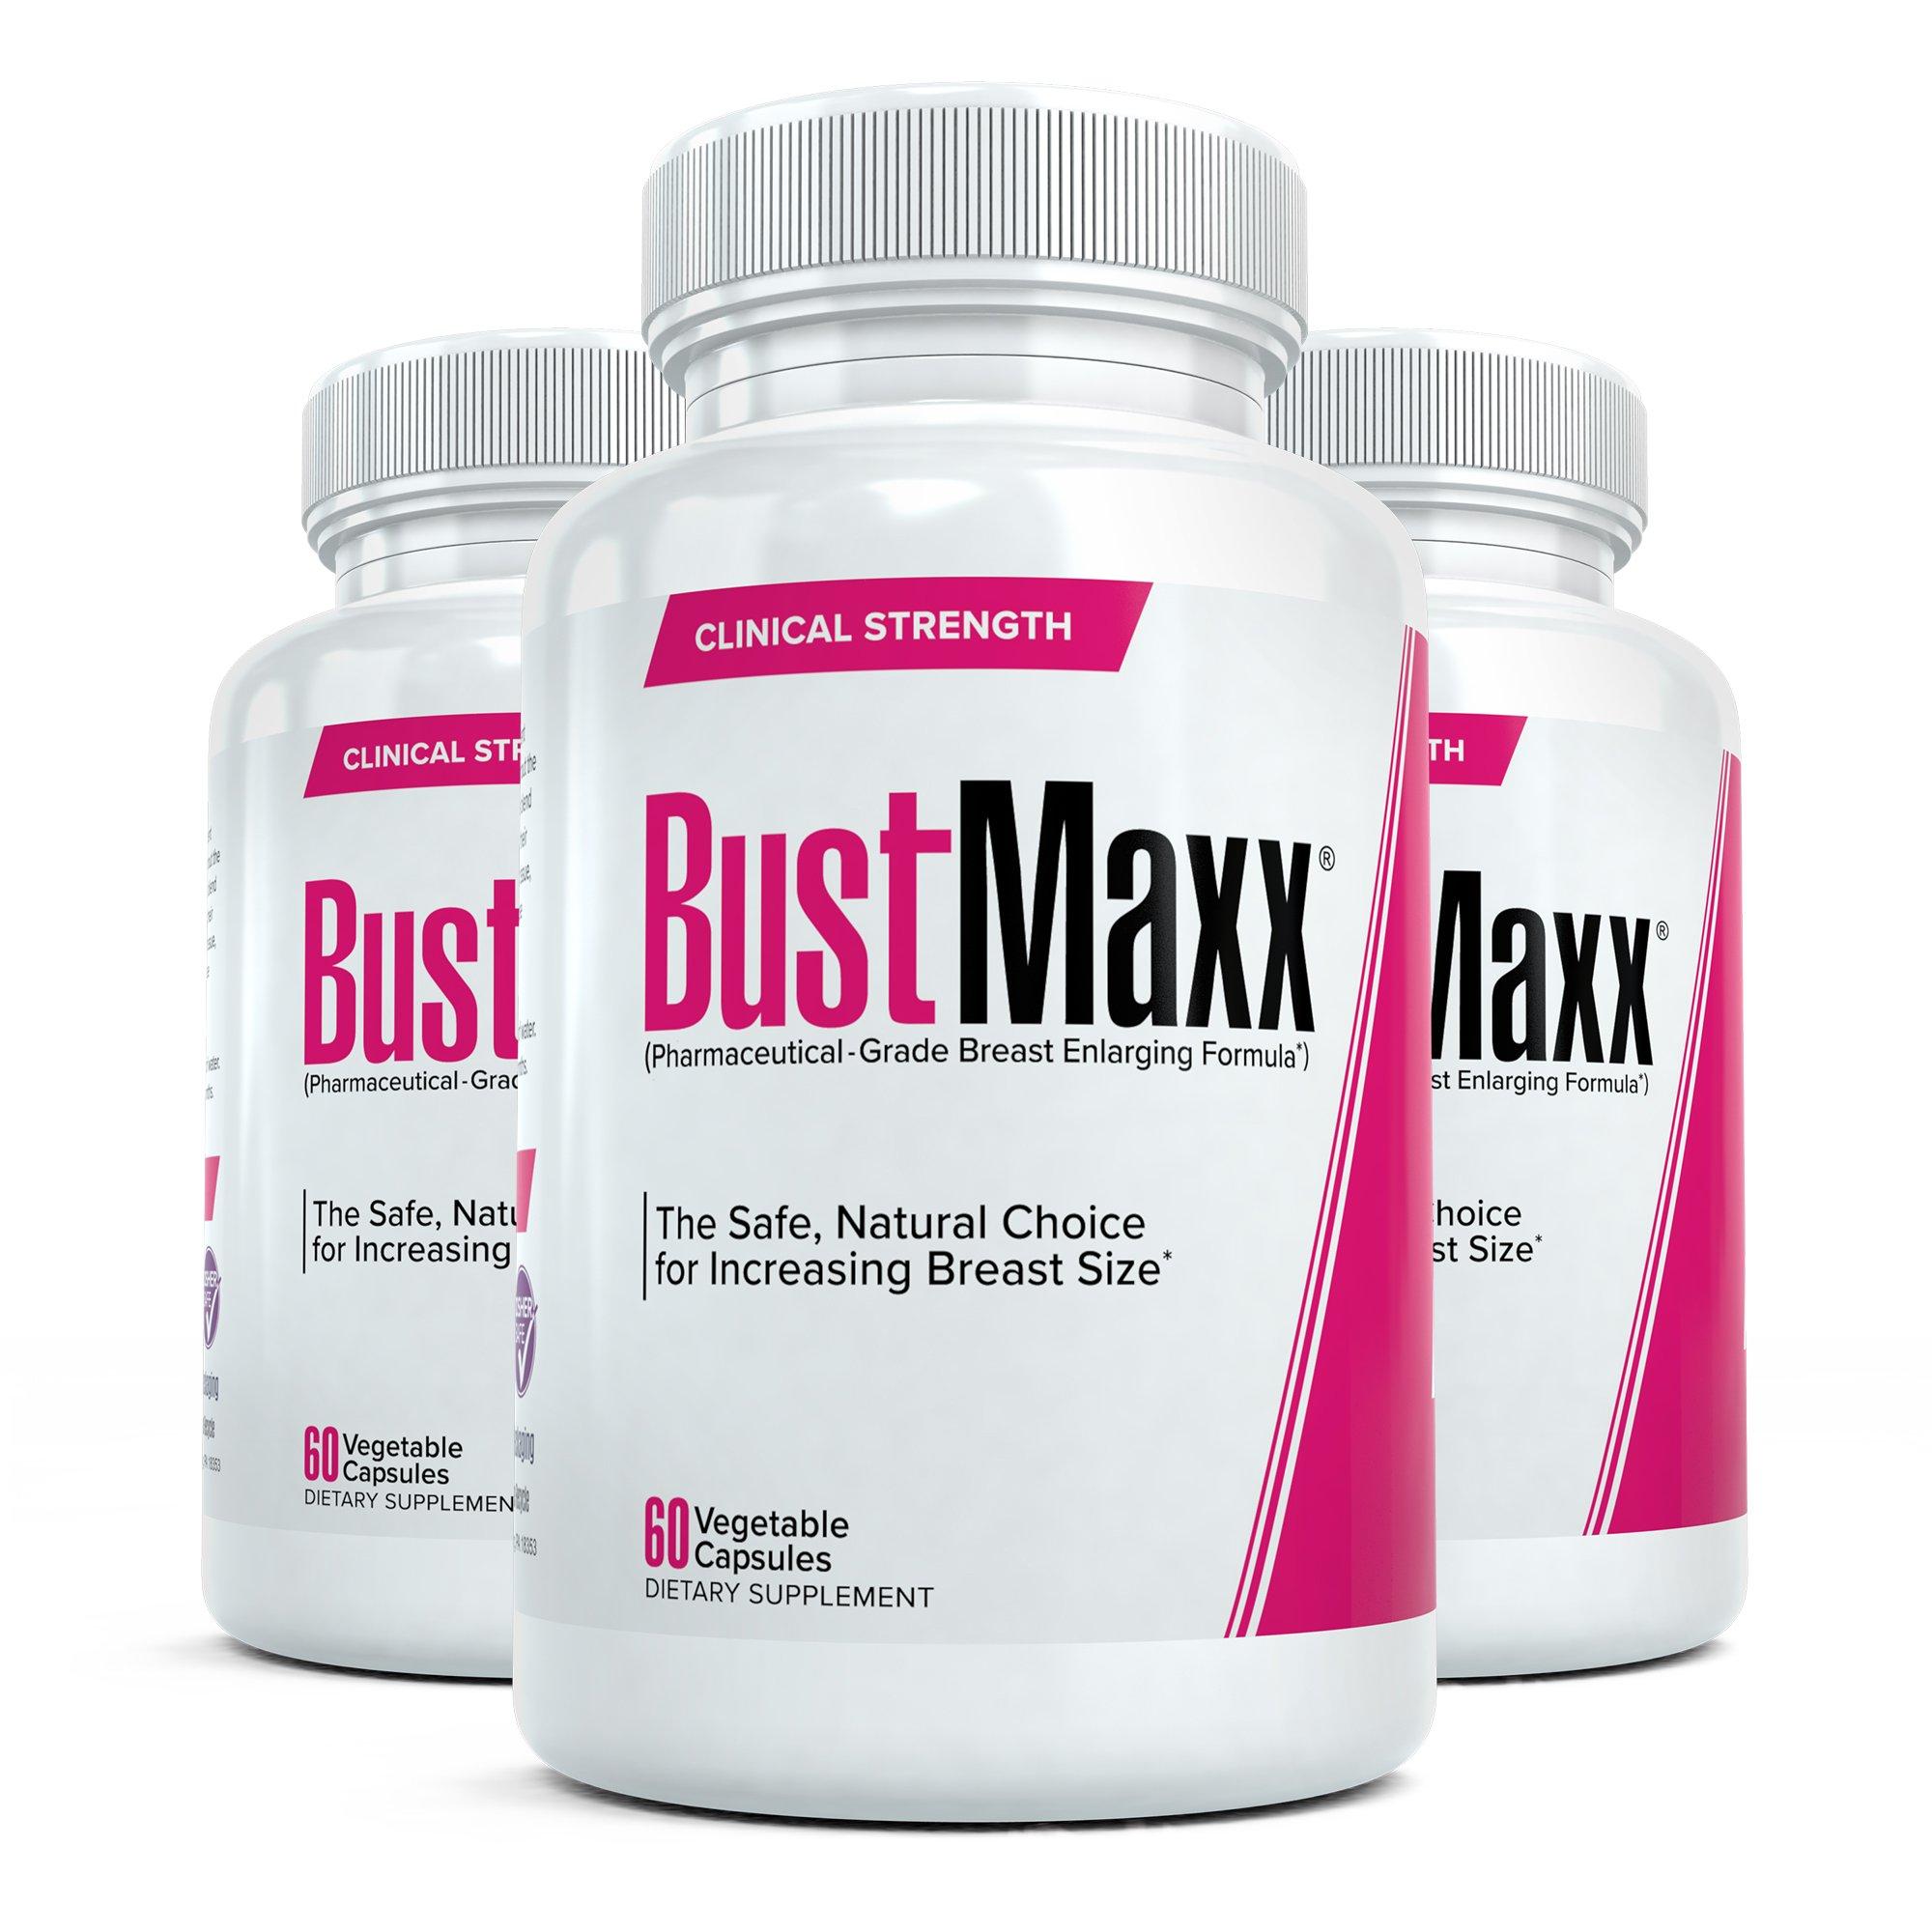 Bustmaxx All Natural Bust Enlarging & Enhancement Supplement Capsules, 180 Count